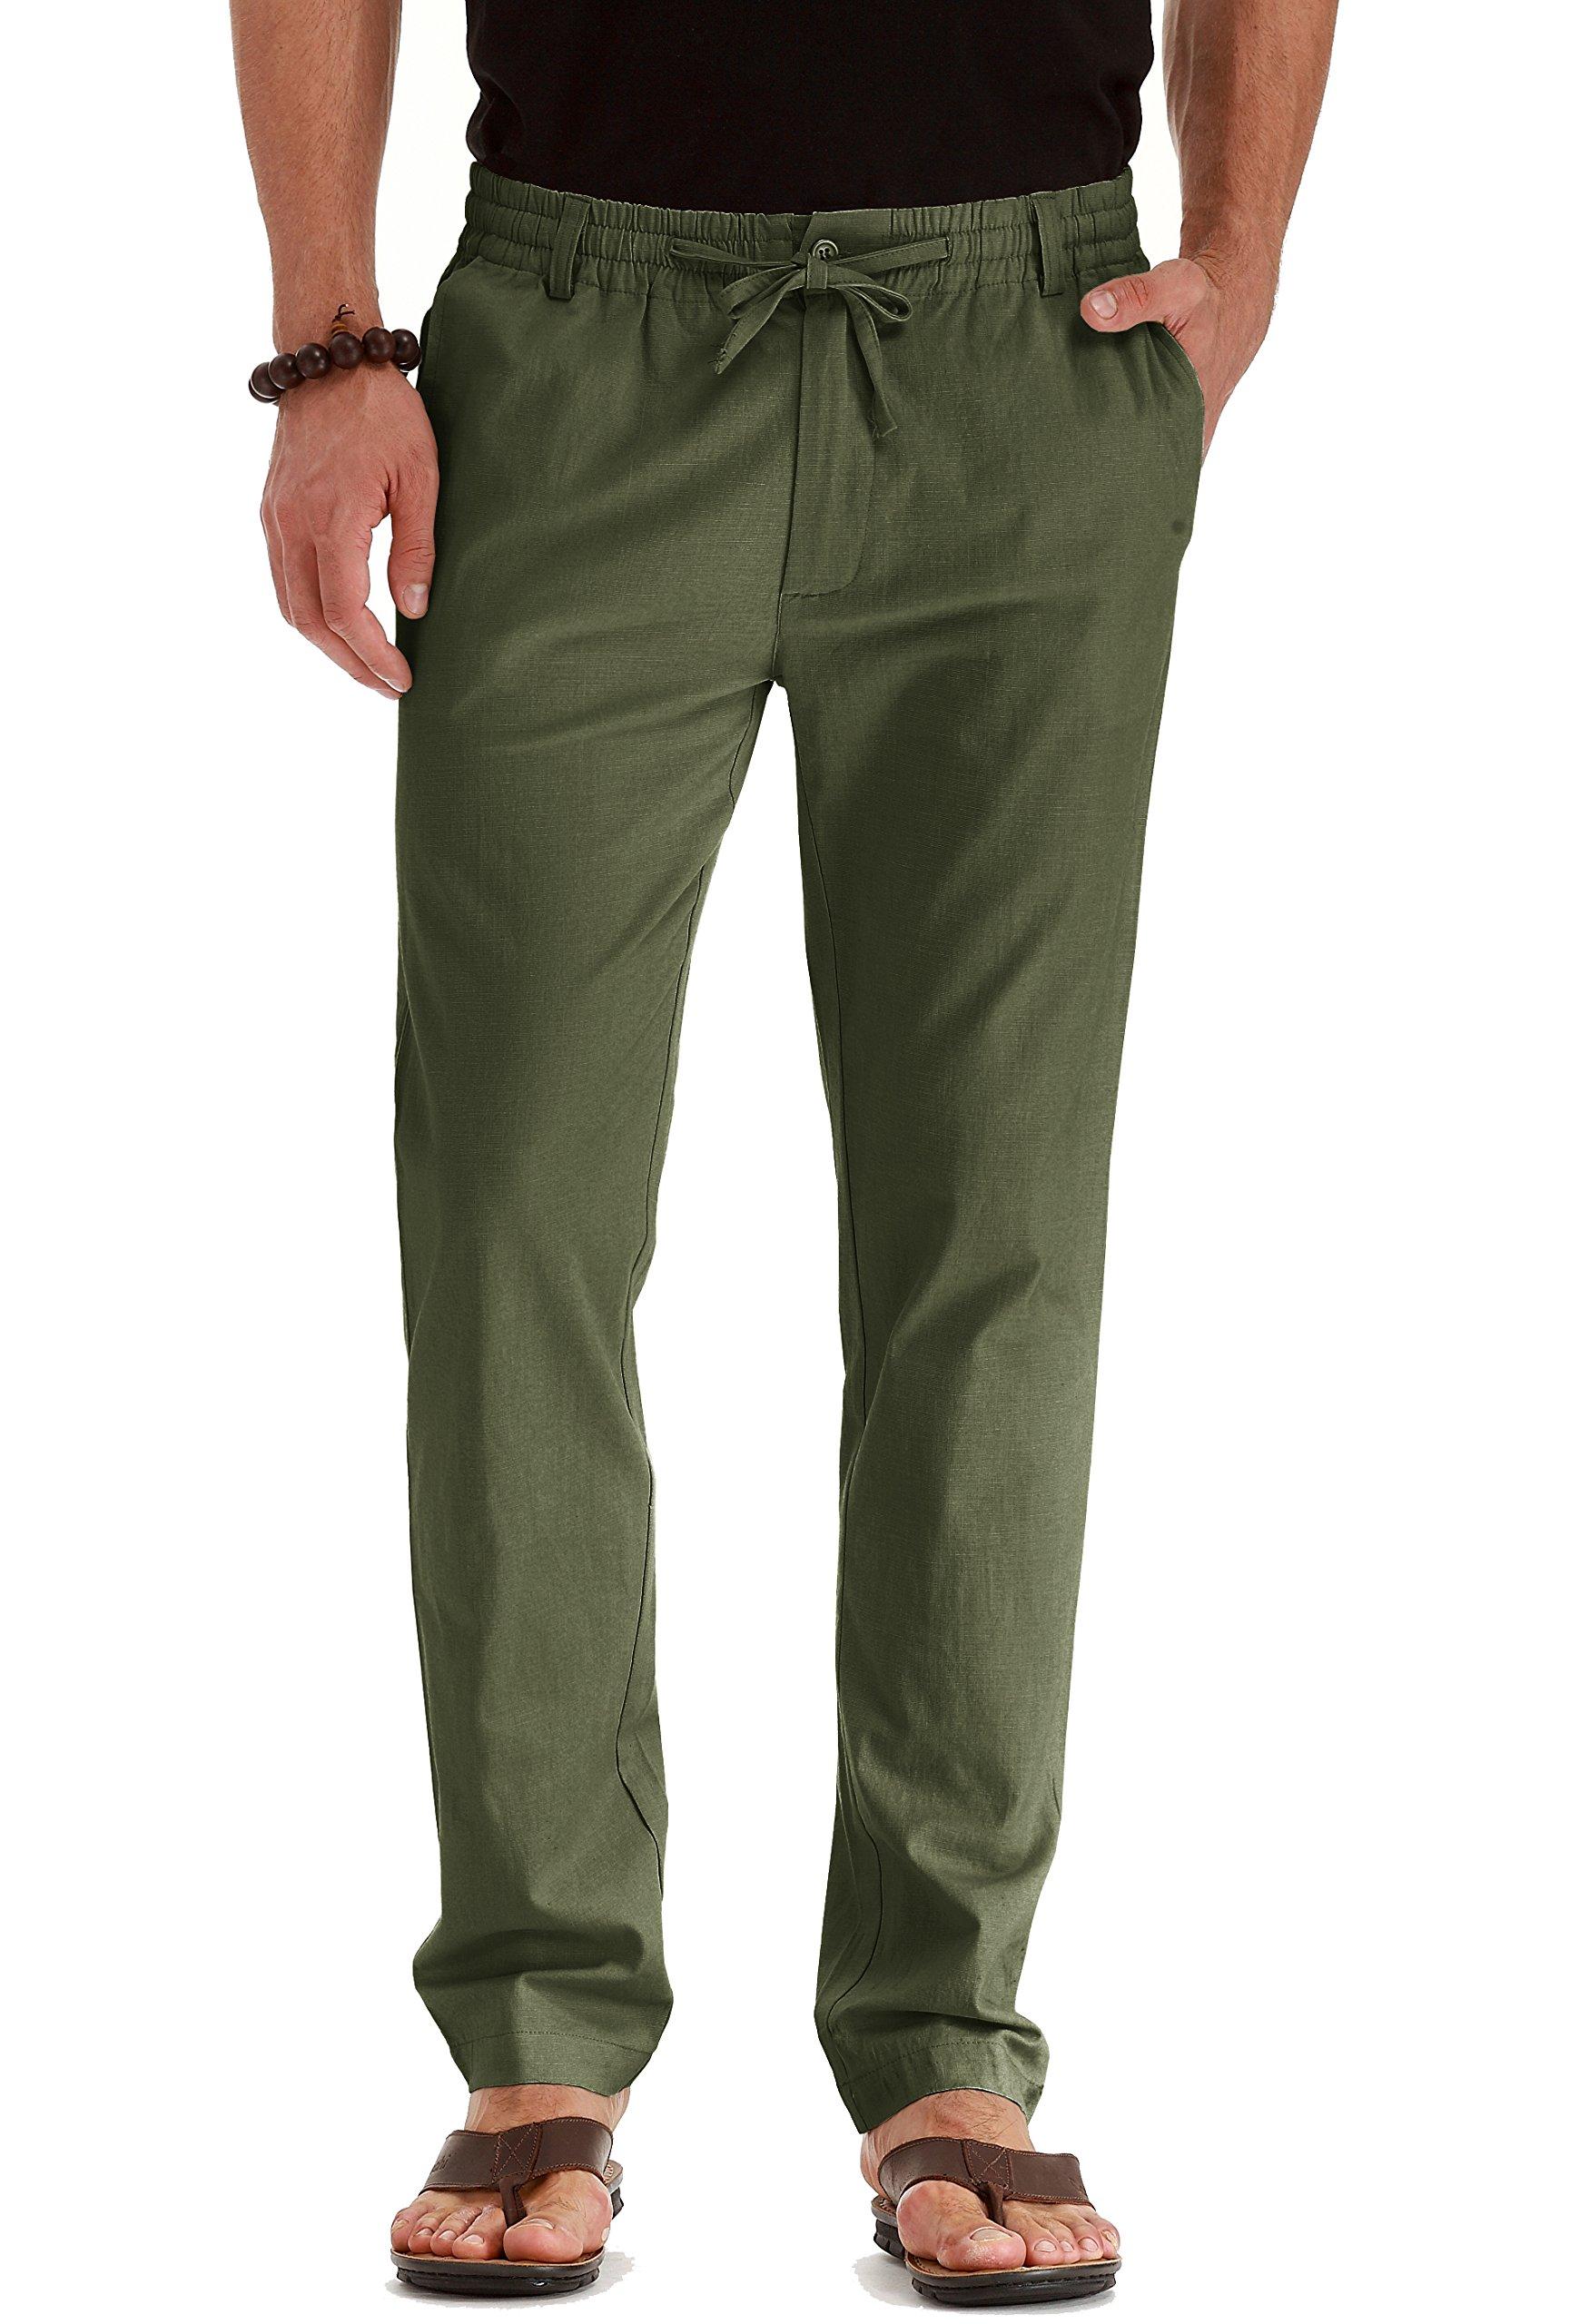 Mr.Zhang Men's Drawstring Casual Beach Trousers Linen Summer Pants Army Green-US 40